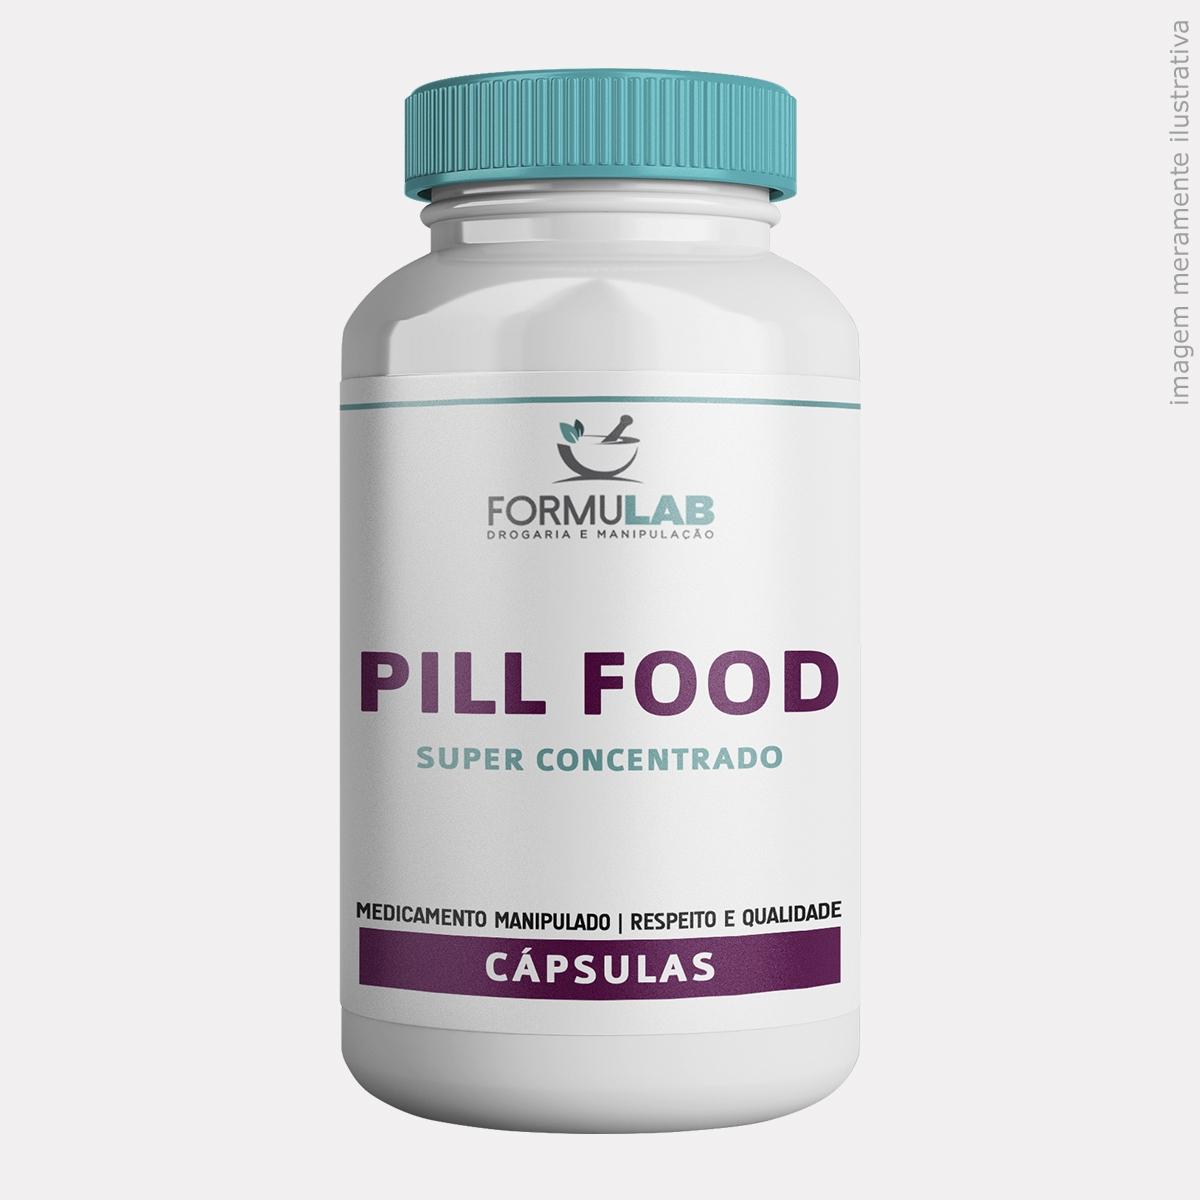 Pill Food Turbinado - Biotina + Cisteína + Cistina + Colágeno + Metionina + Pantotenato de Cálcio + Vitamina B2 + Vitamina B6 + Vitamina E + Vitamina A + Silicio + MSM